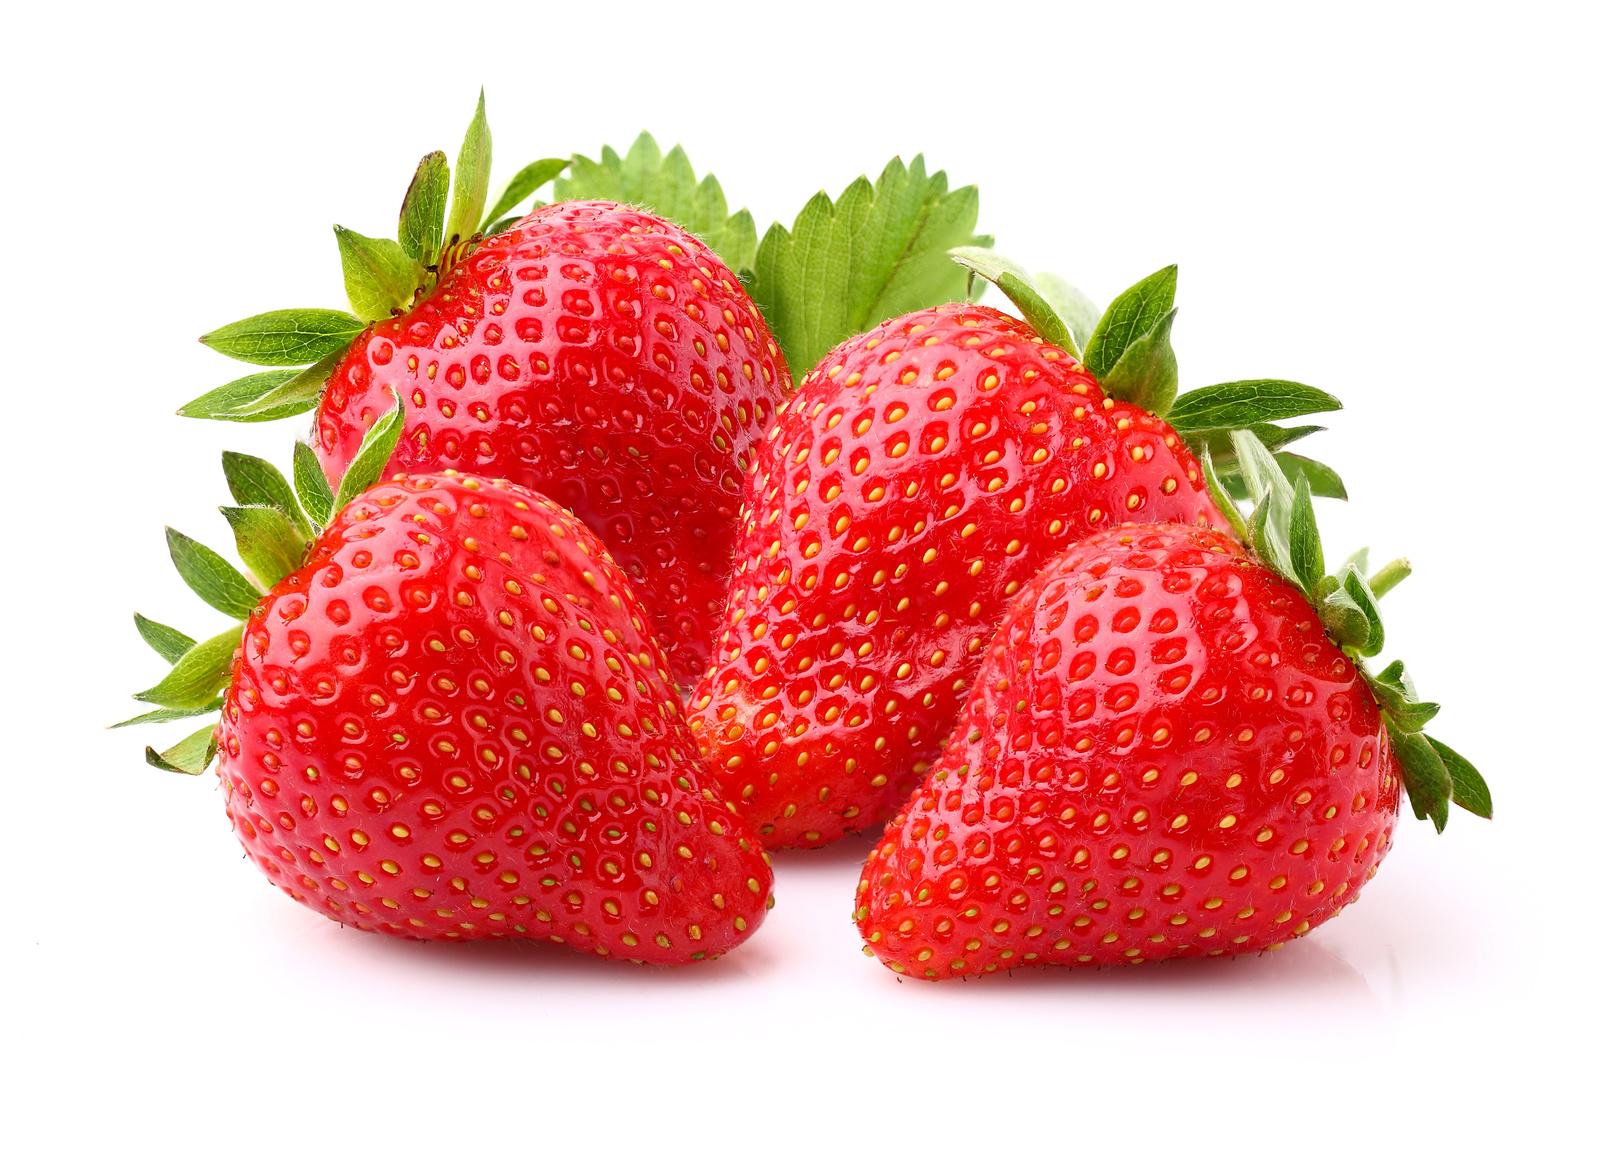 Ripe strawberry with leaf